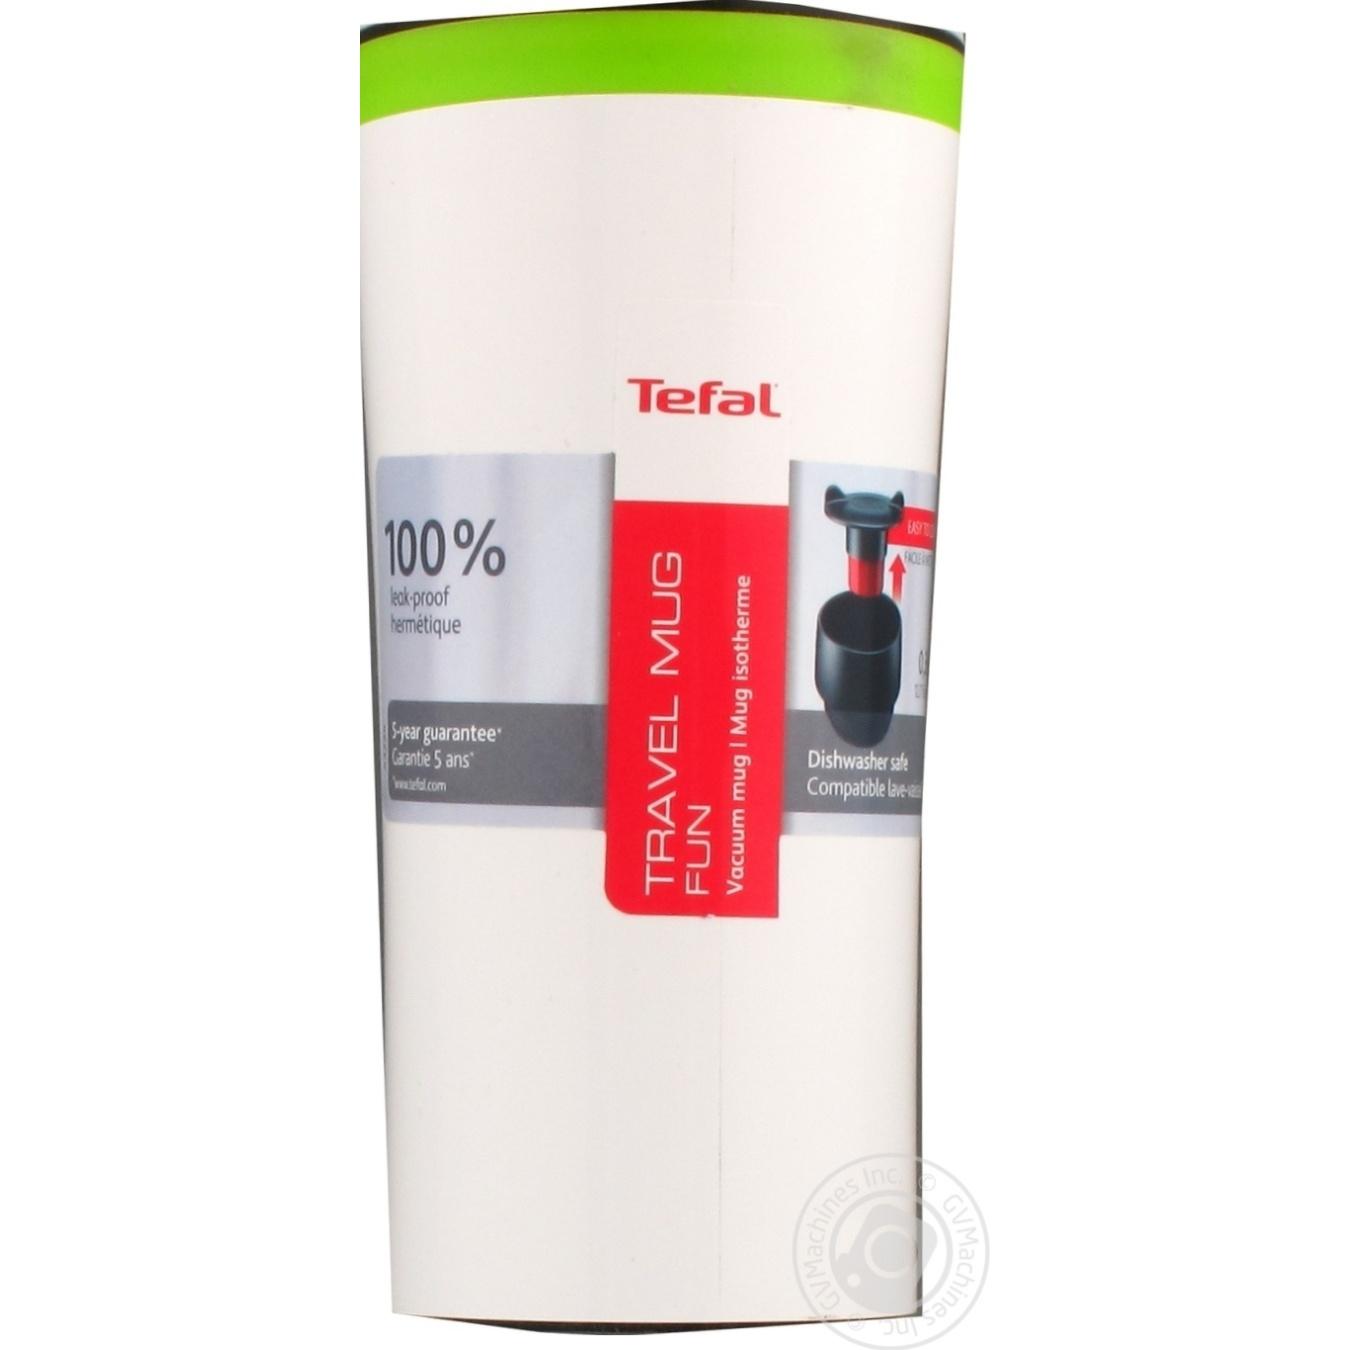 Tefal Travel Food 360ml Kitchenware → Household Mug T3lFJKcu1